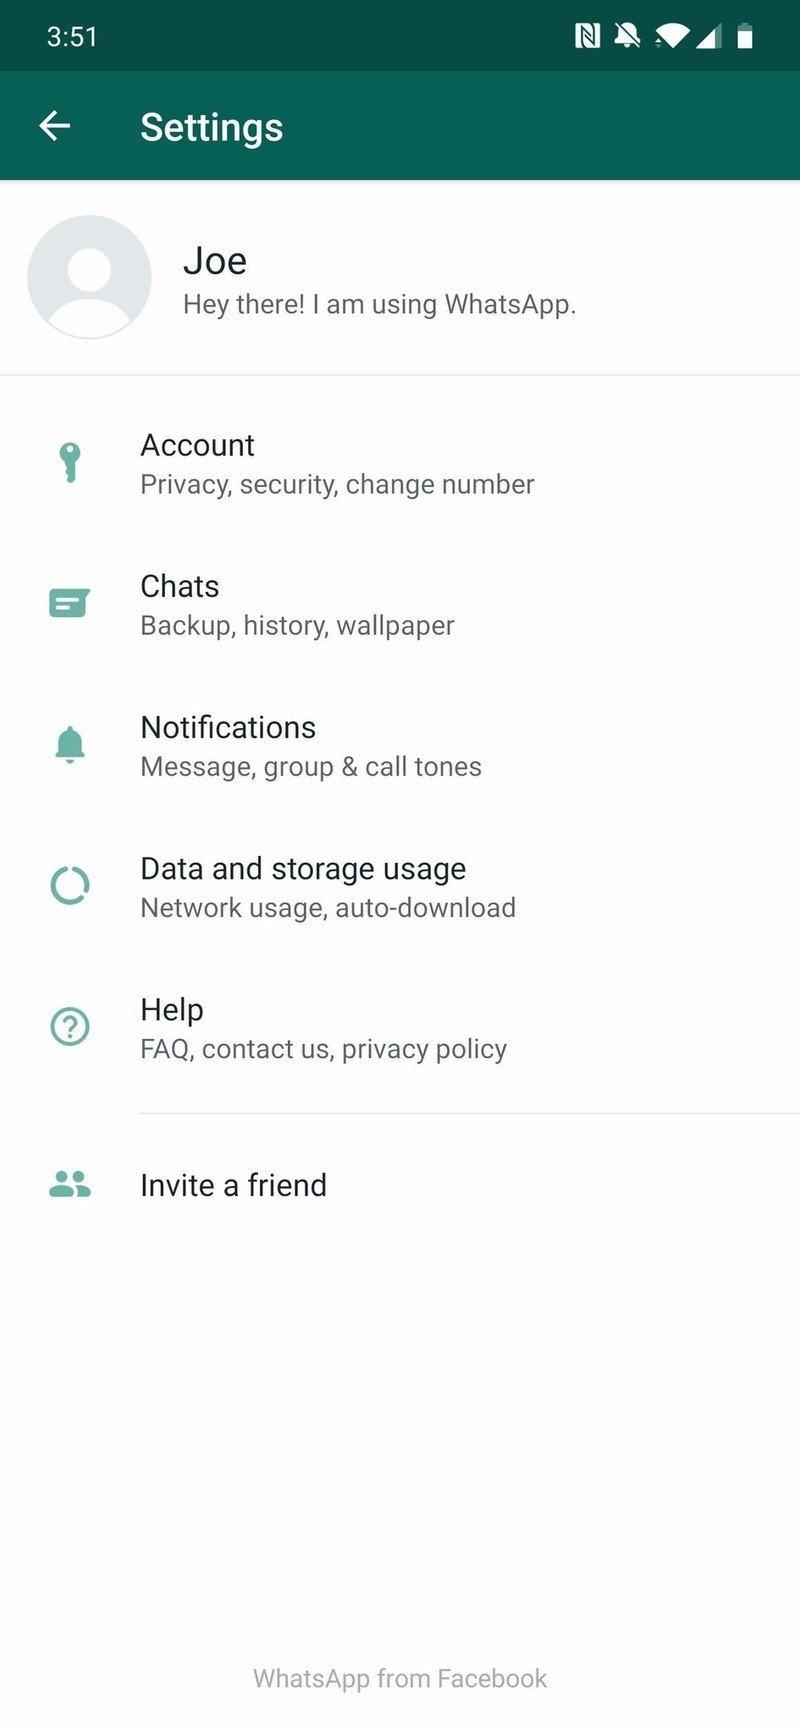 whatsapp-backup-messages-8.jpg?itok=SuLa